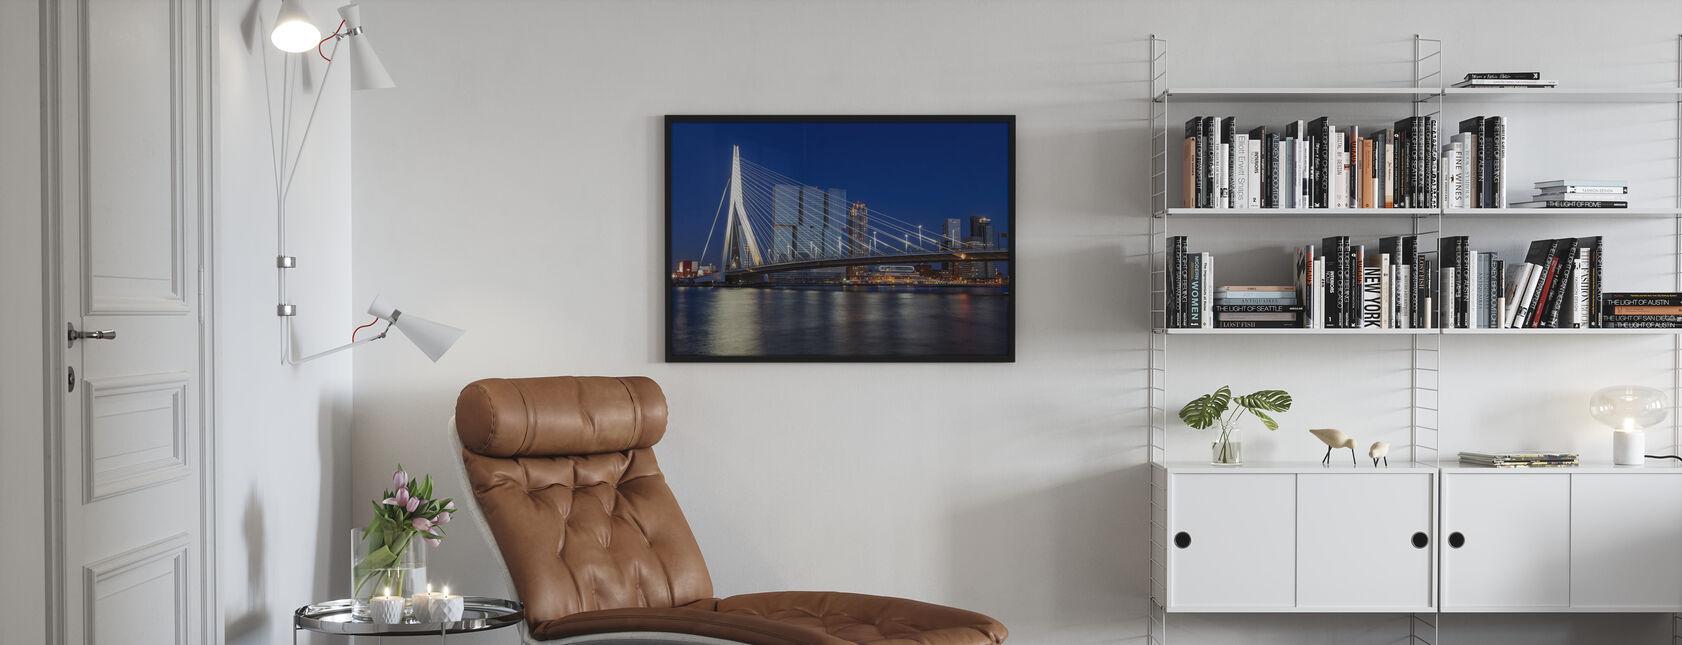 Erasmus Bridge and River Meuse in Rotterdam - Framed print - Living Room